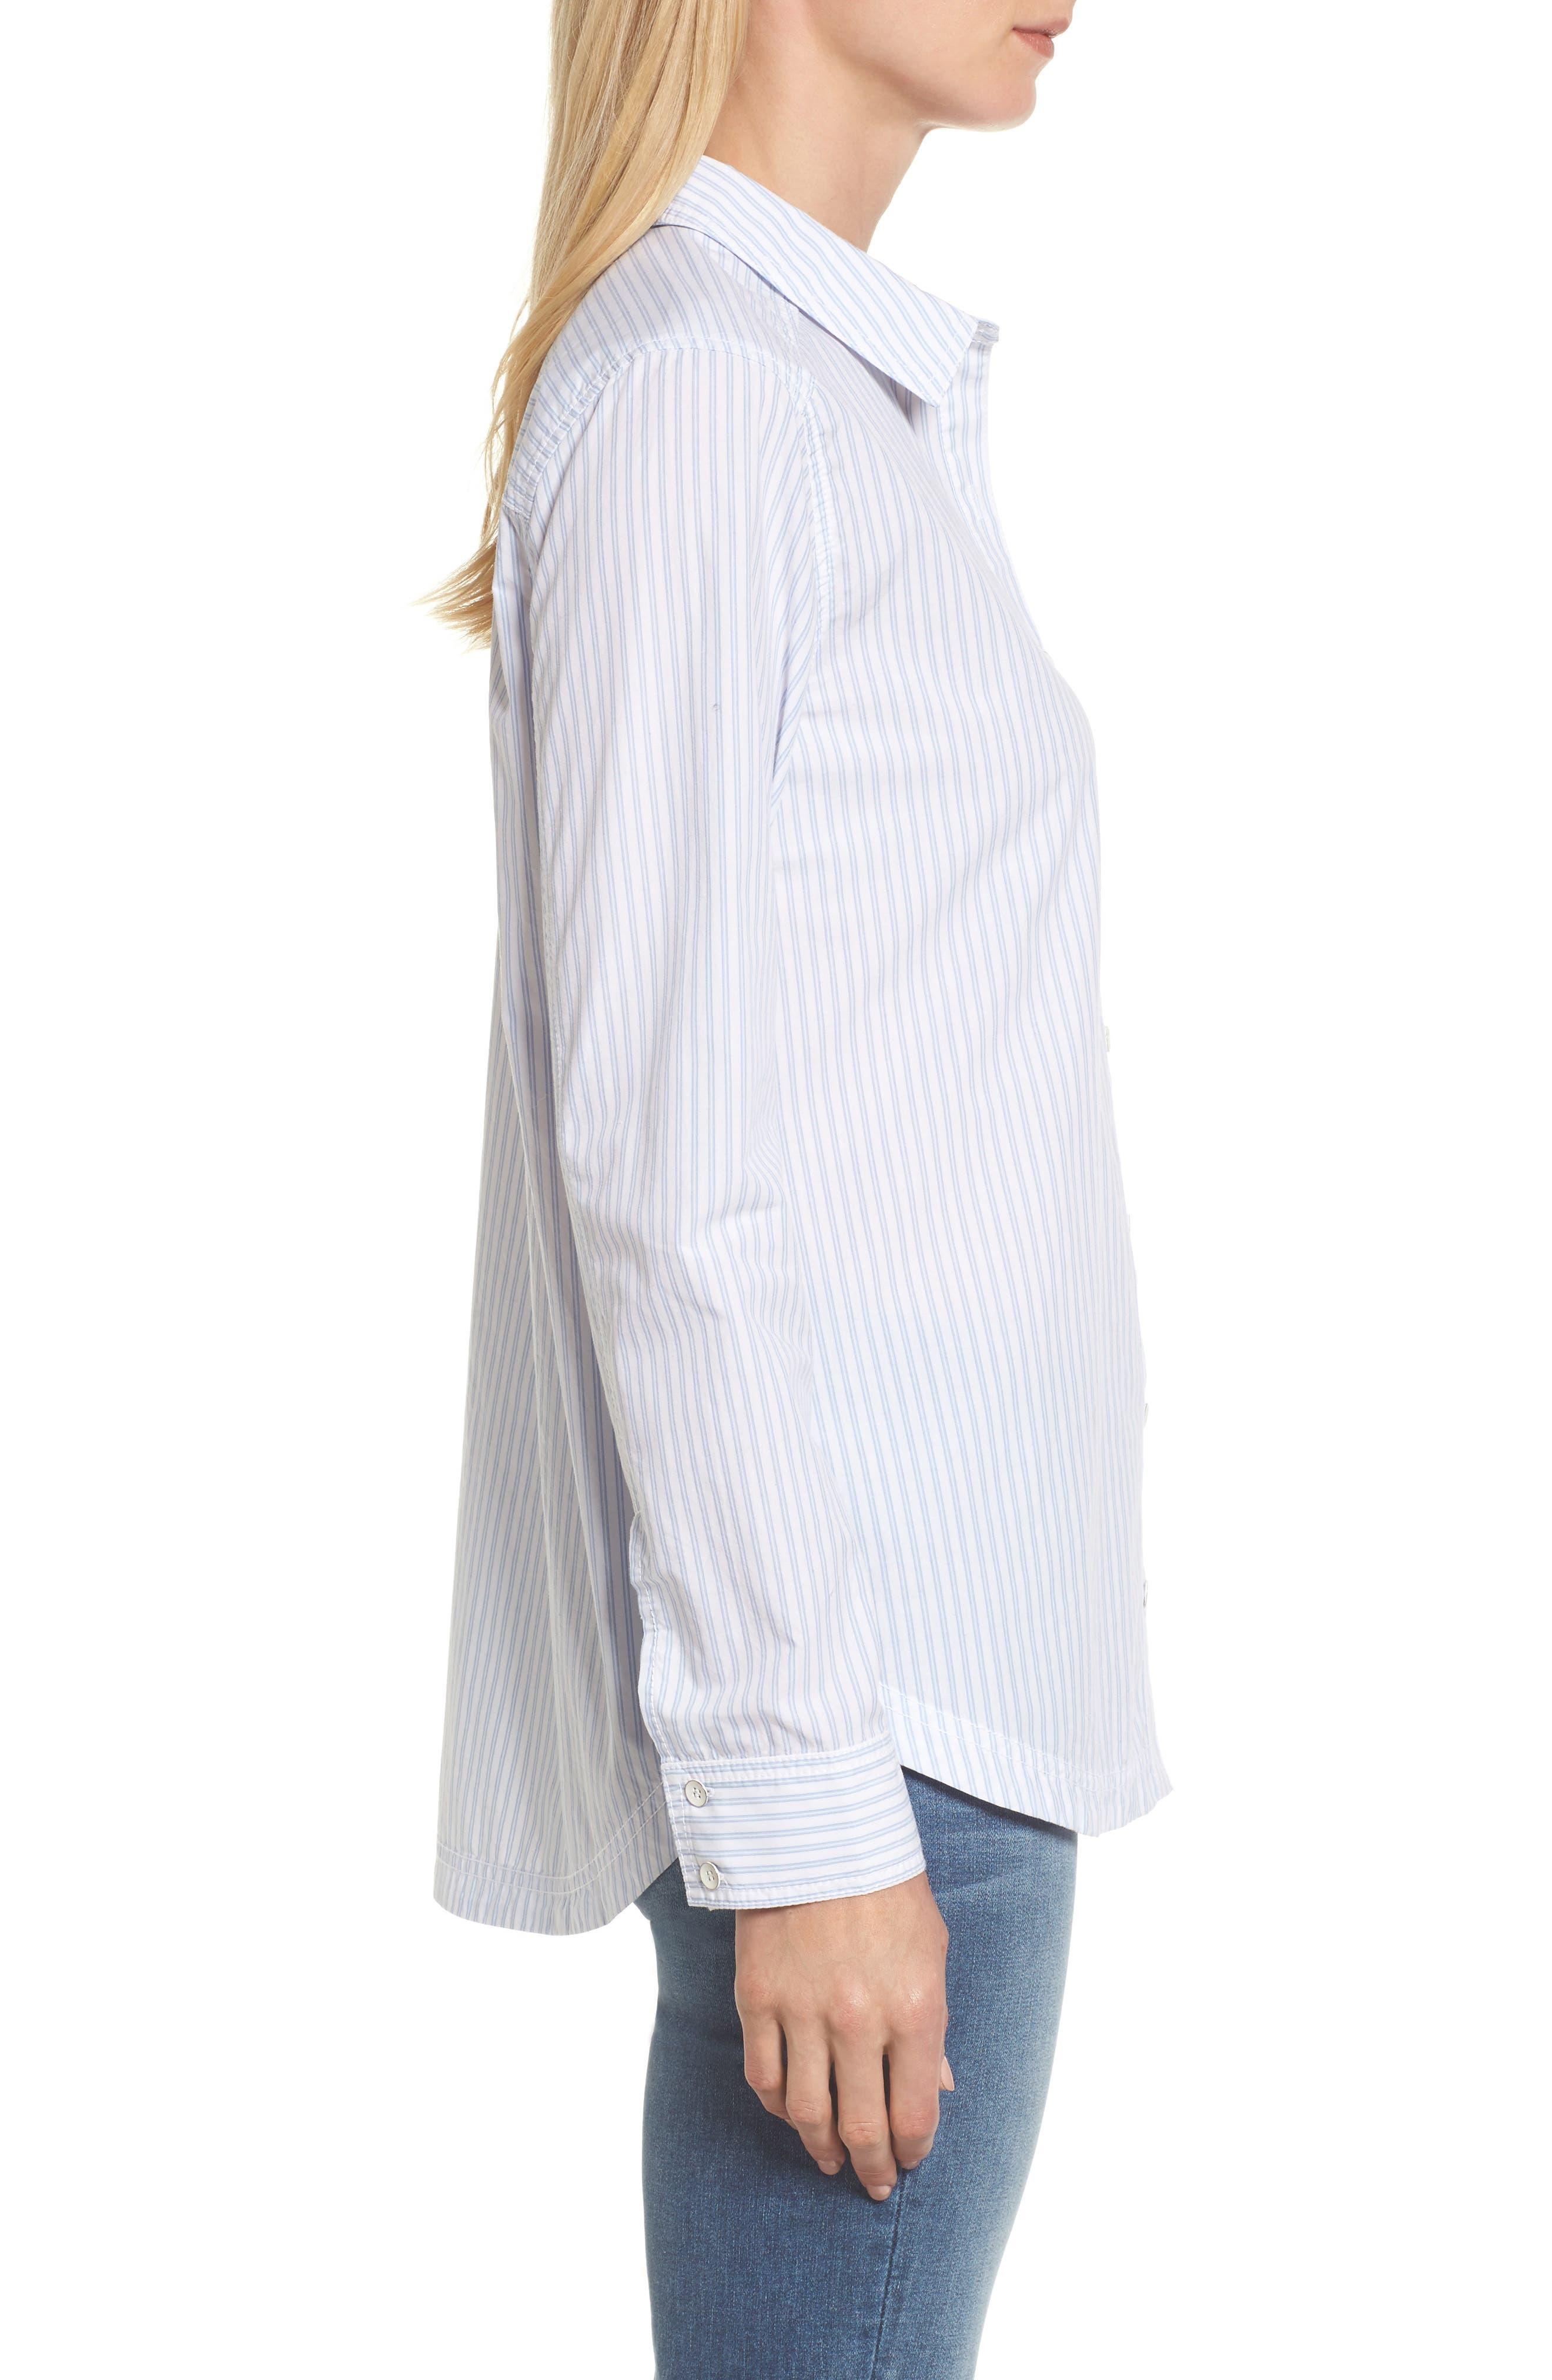 Button Front Pocket Shirt,                             Alternate thumbnail 3, color,                             White- Blue Stripe